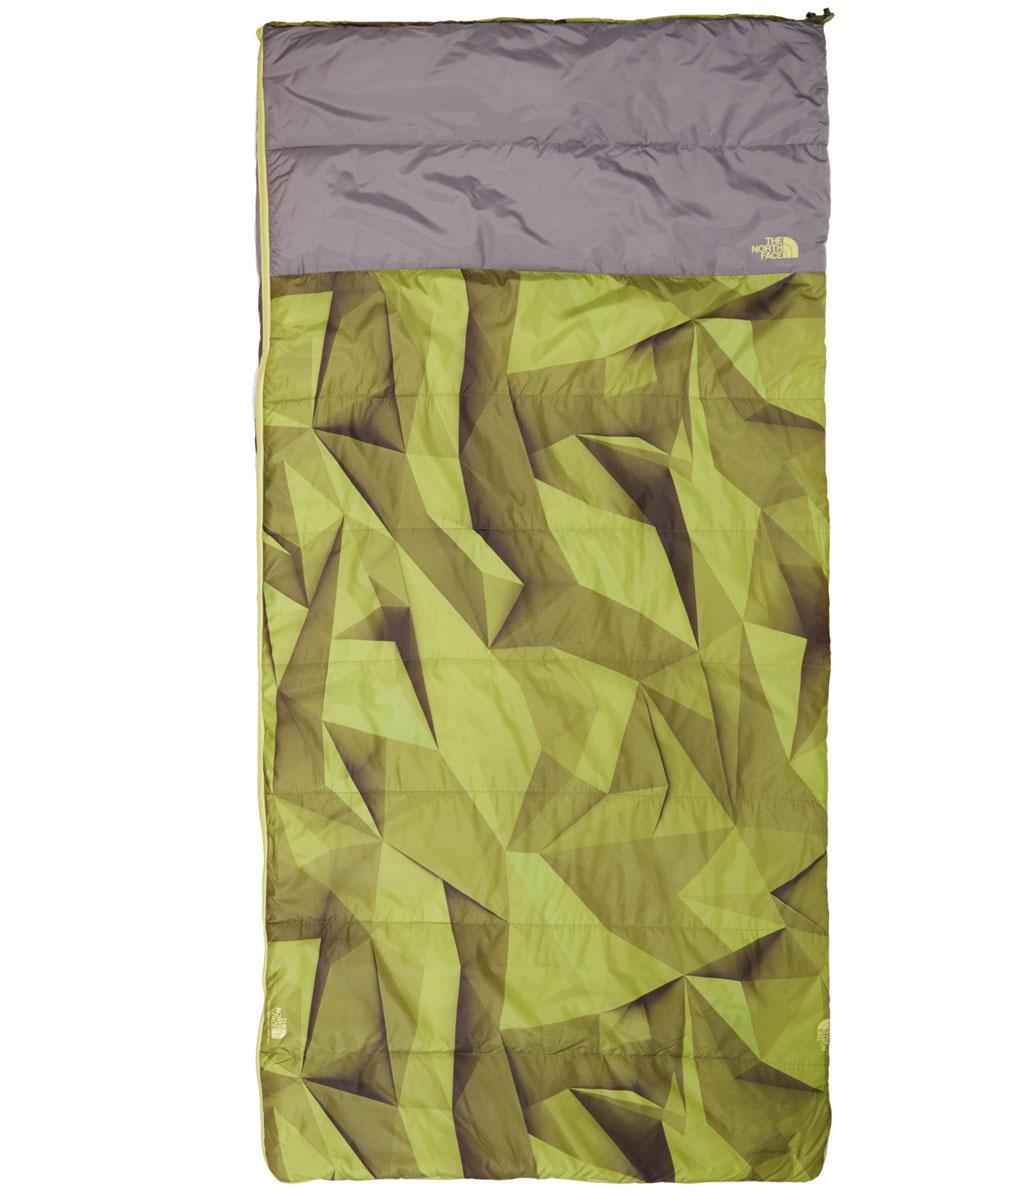 Спальный мешок The North Face Homestead Twin 40/4, цвет: зеленый. T0CJ2YHAPRH REG copton cj 4 5w 40